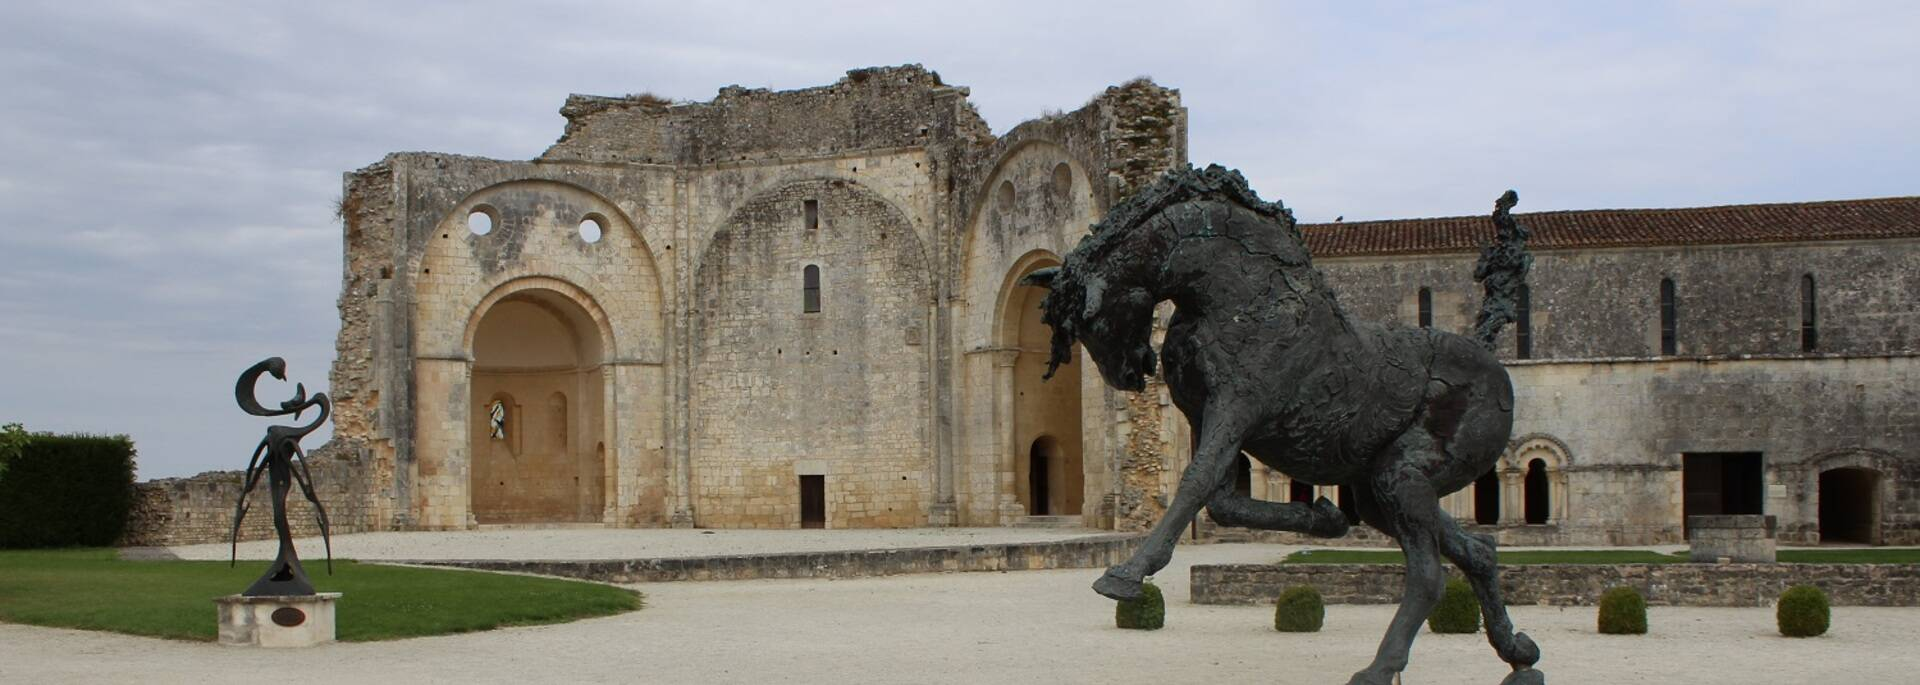 Cour de l'Abbaye de Trizay - ©P.Migaud / FDHPA17